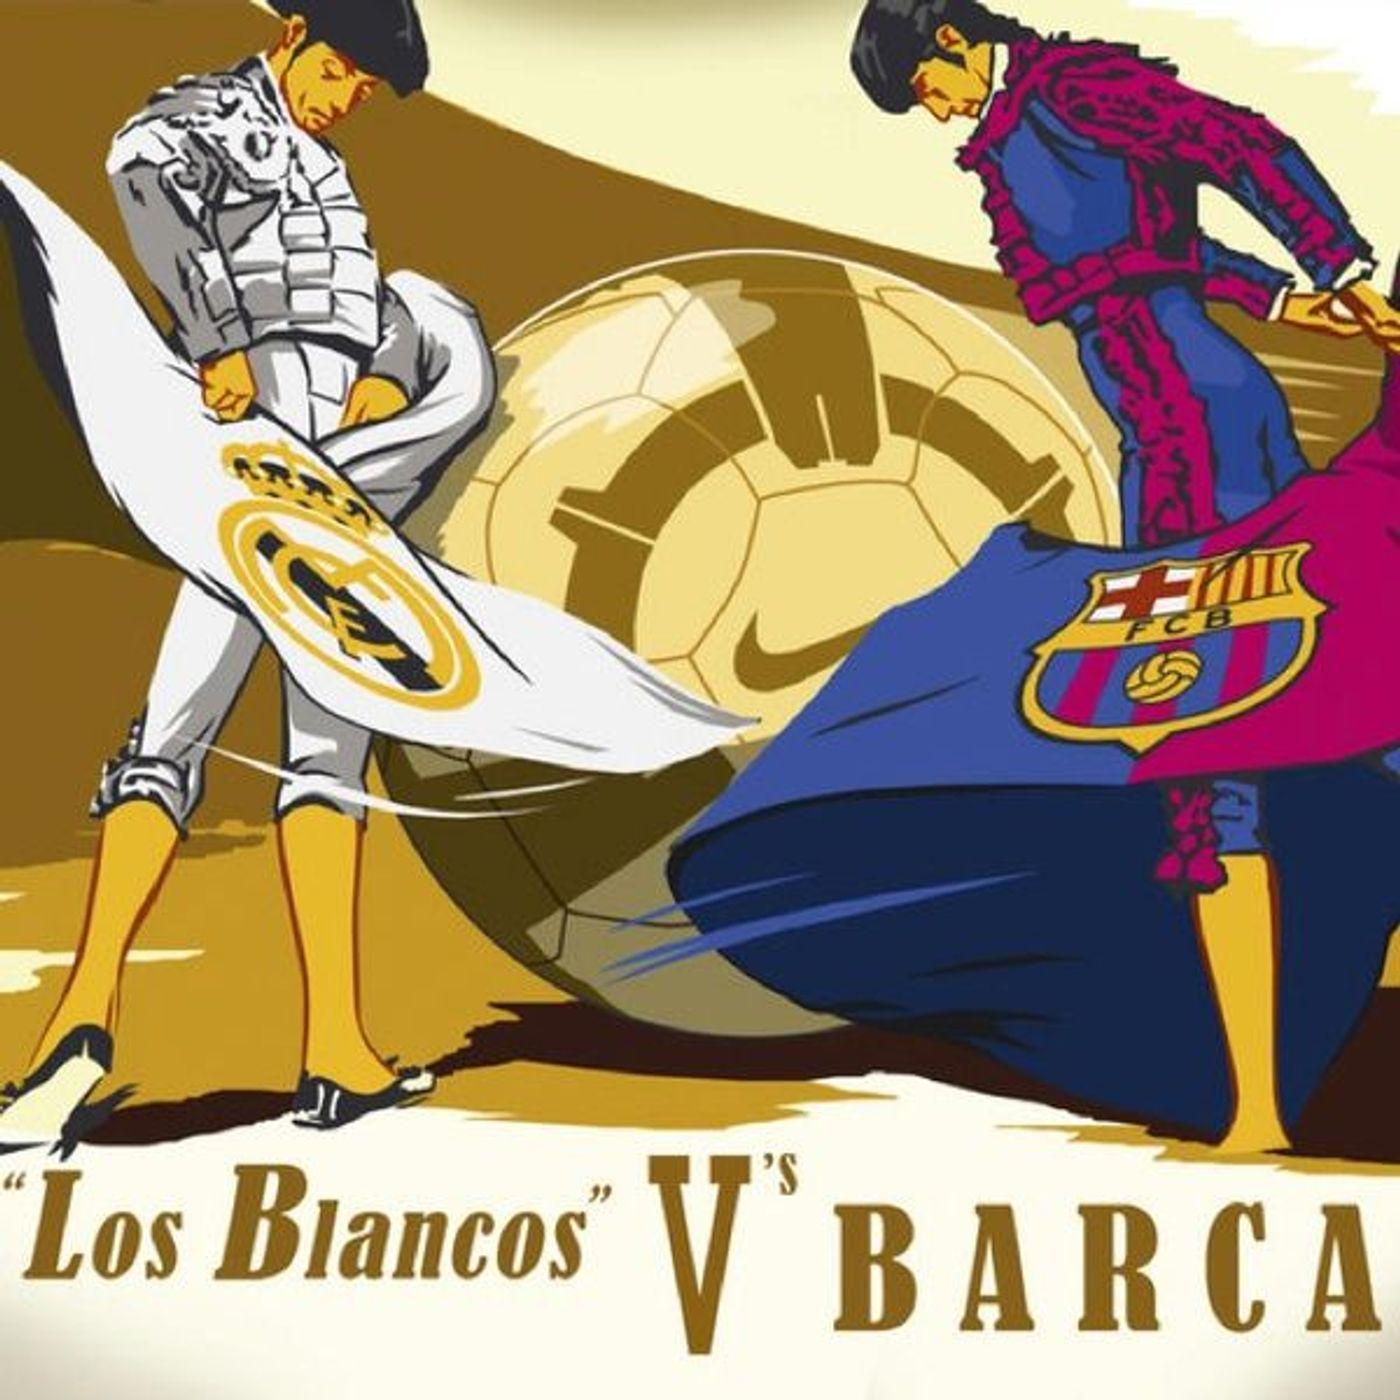 Euro Trip: Soccer Weekend (Best Bets Across Continental Europe 04/10 - 04/11)